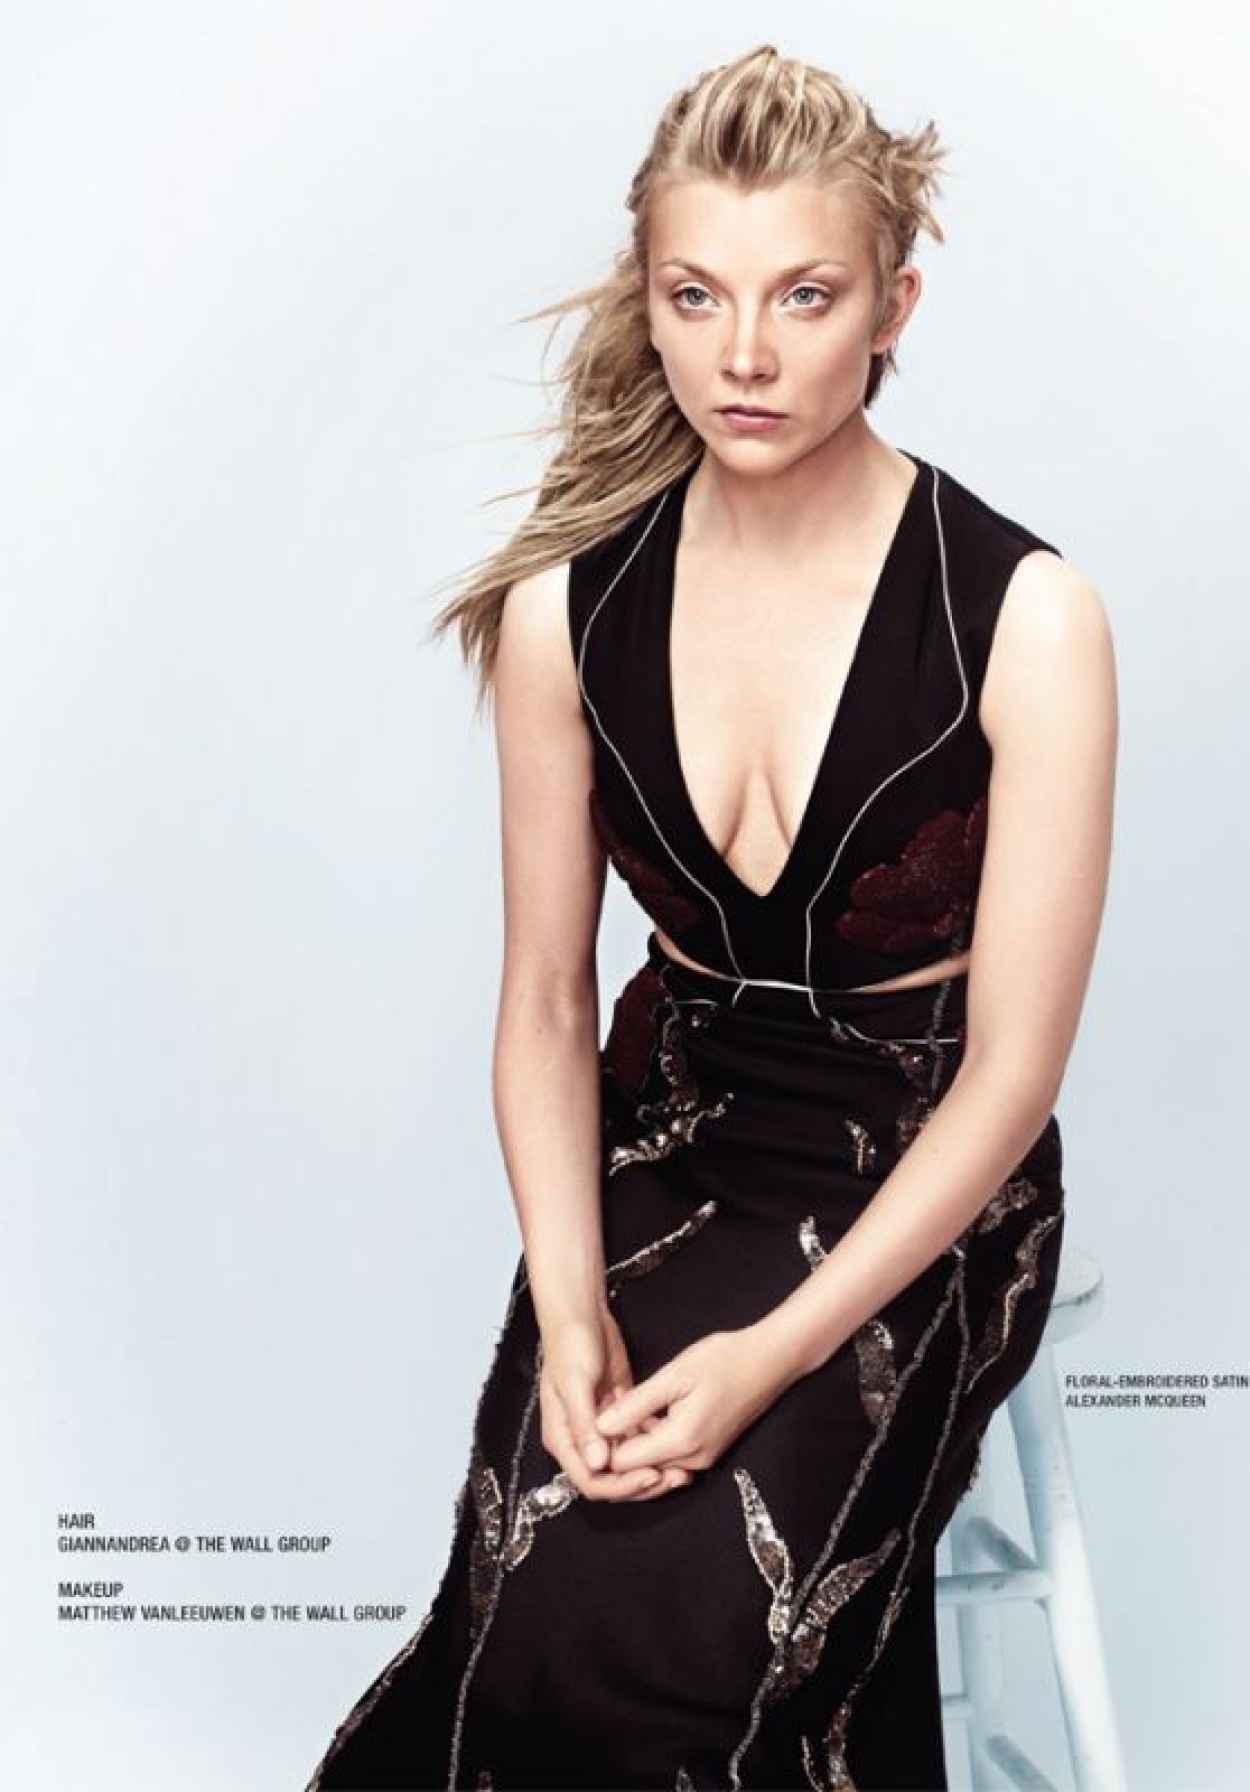 Natalie Dormer - Photoshoot for VVV Magazine 2015-1